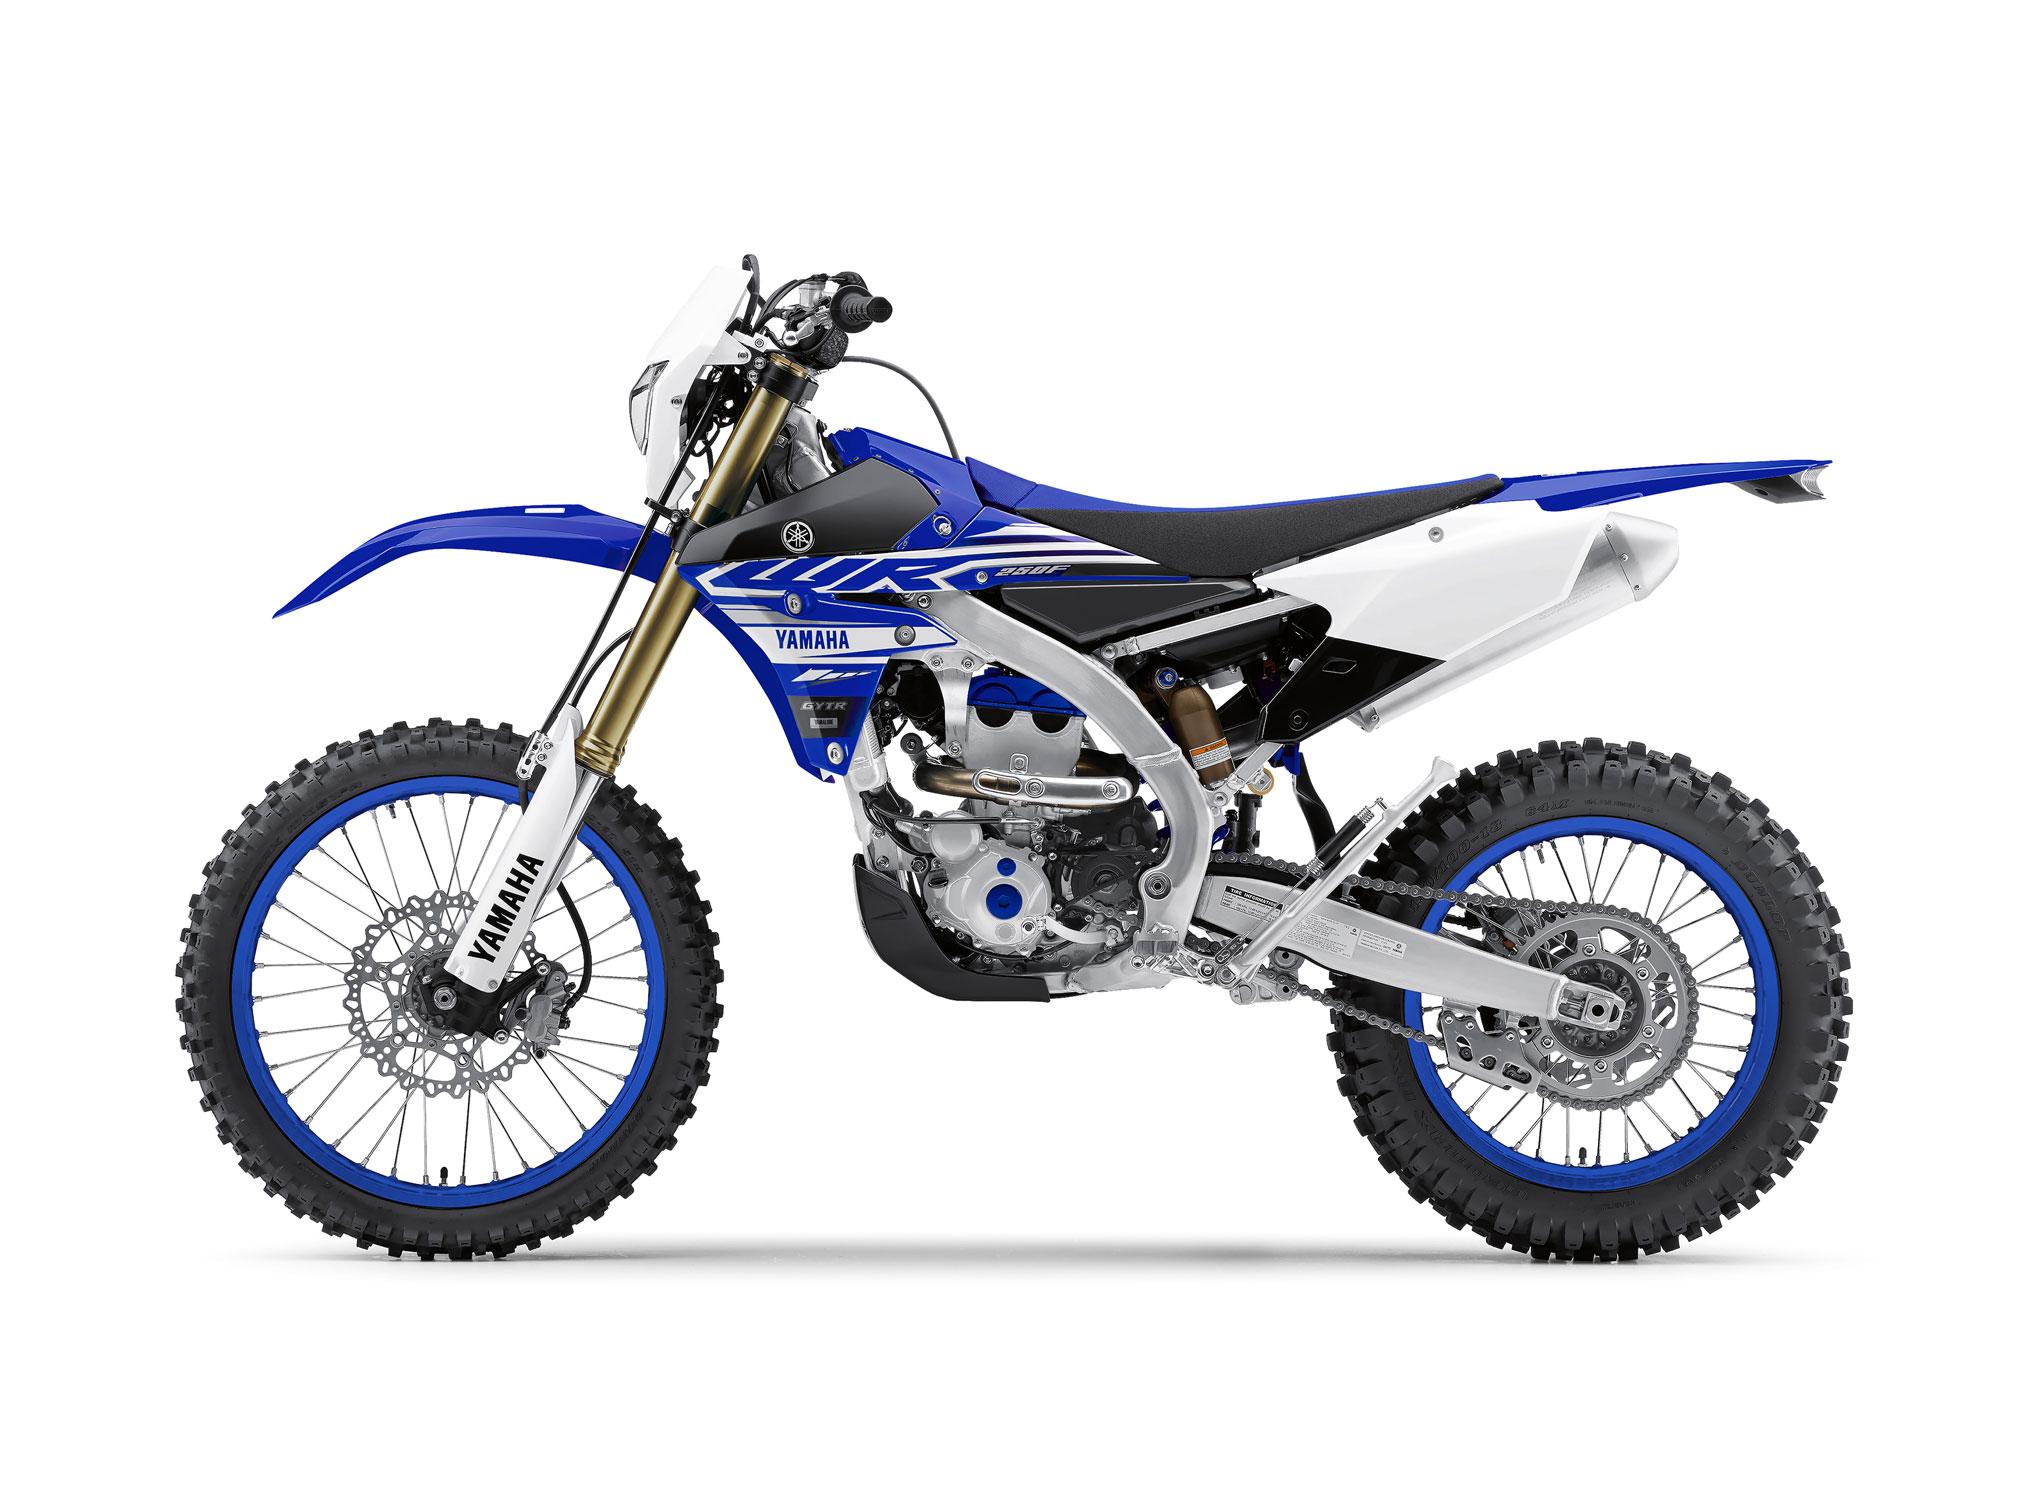 2015 Yamaha WR250F test review impression -- Dirt Bike Test